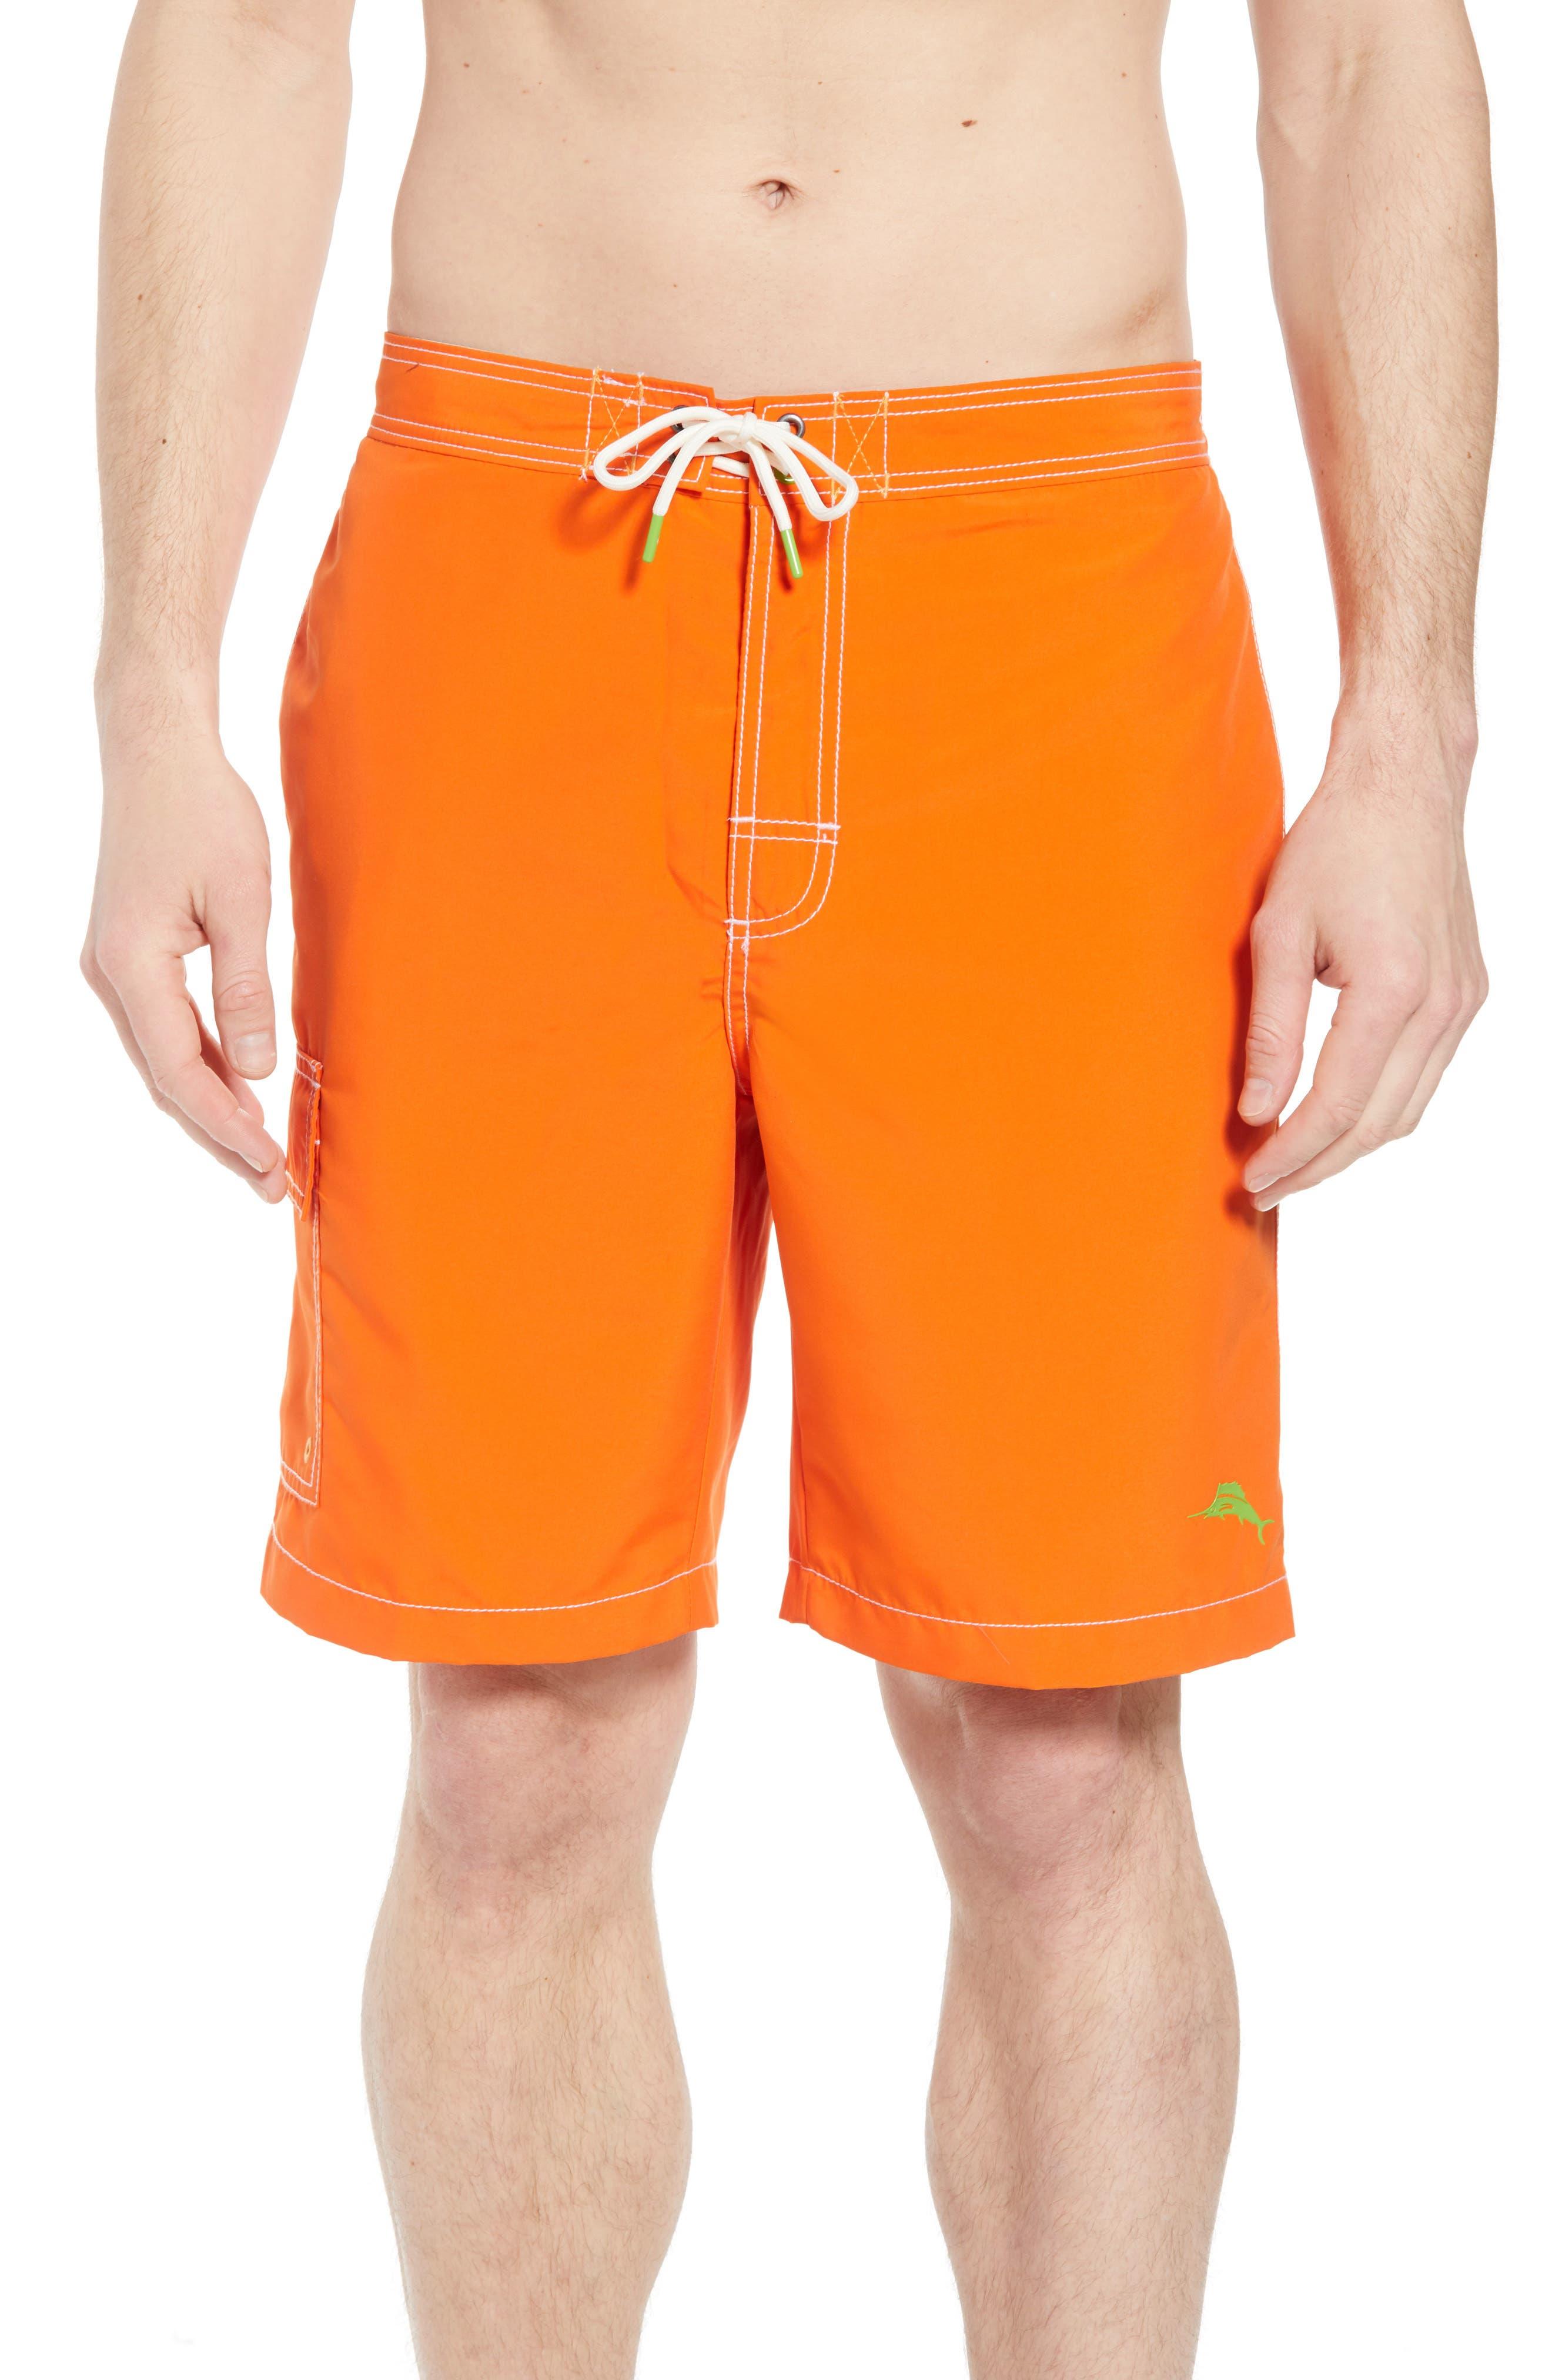 Baja Beach Board Shorts,                             Main thumbnail 1, color,                             Curuba